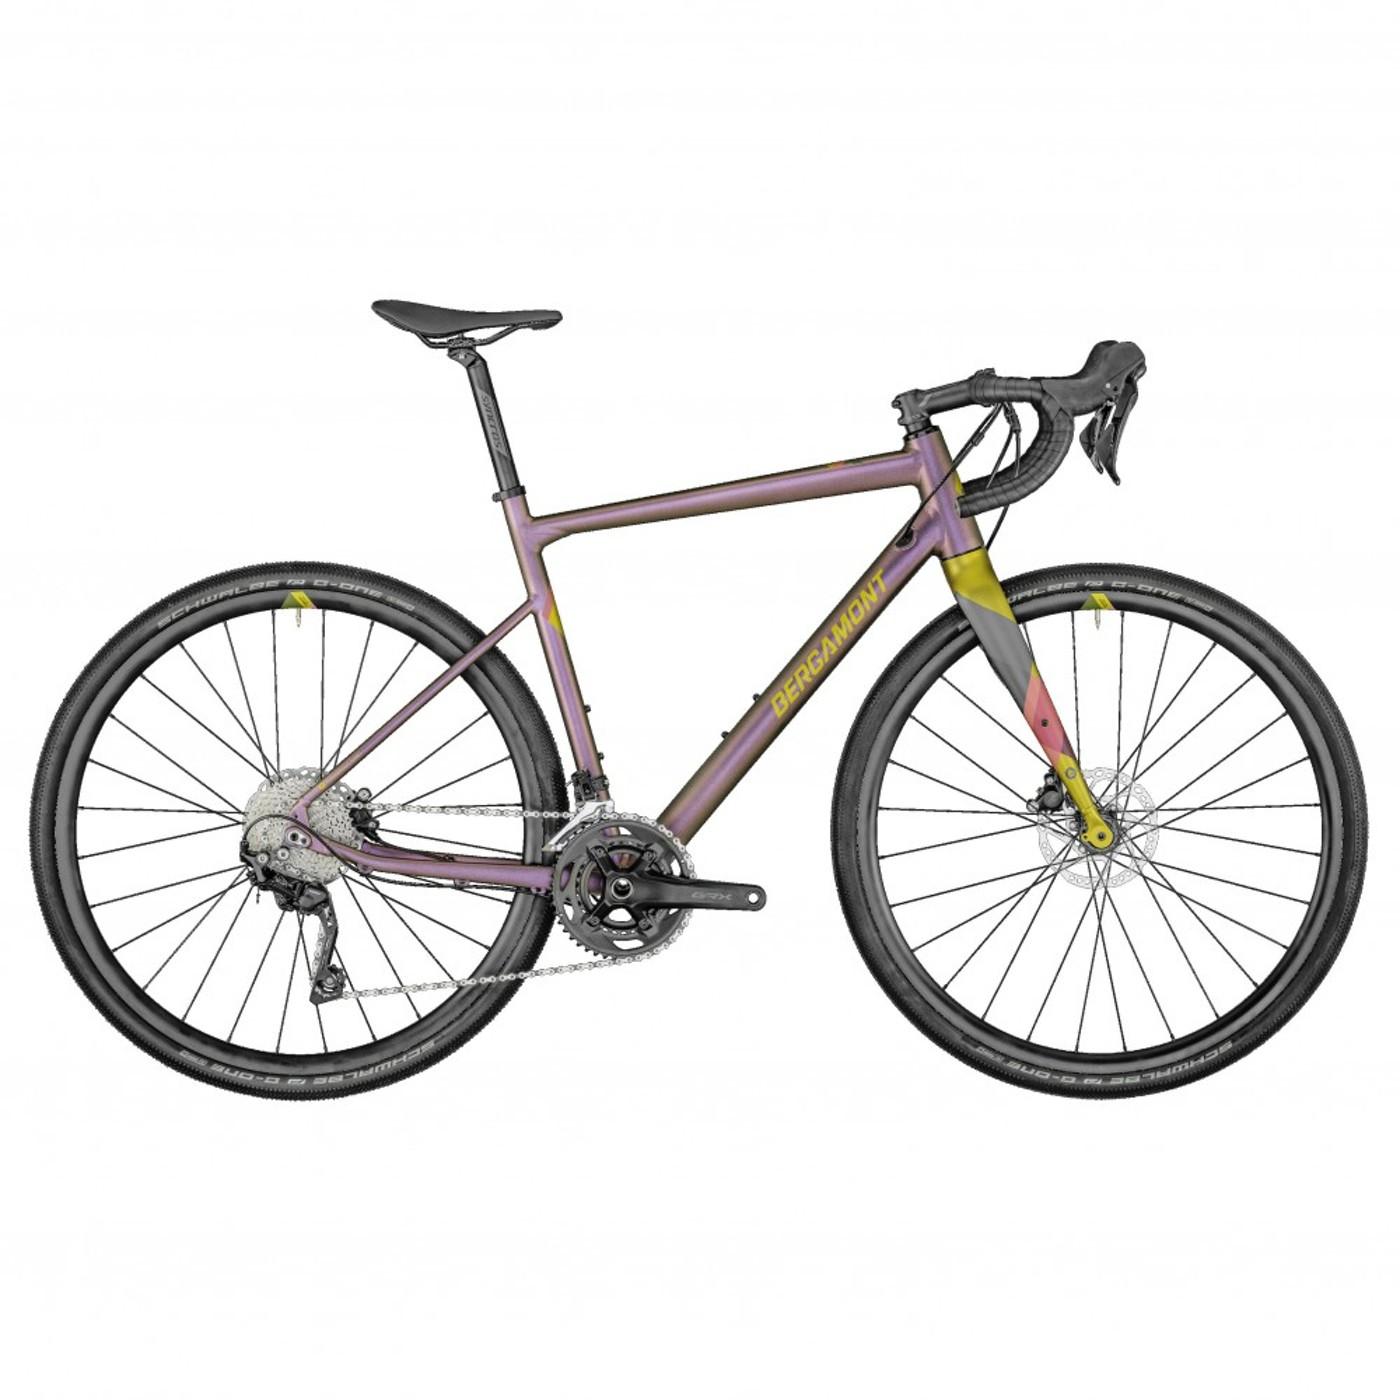 BERGAMONT Bike Grandurance 6 FMN